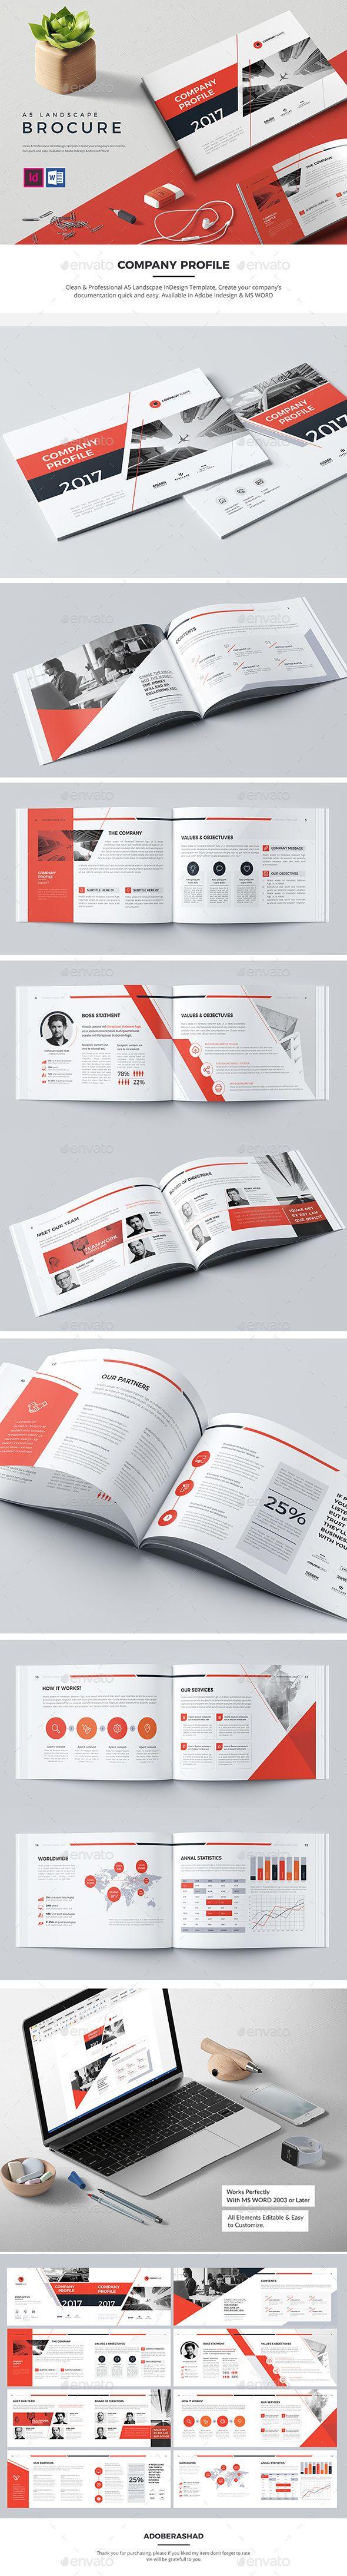 Landscape Company Profile Brochure | Folletos